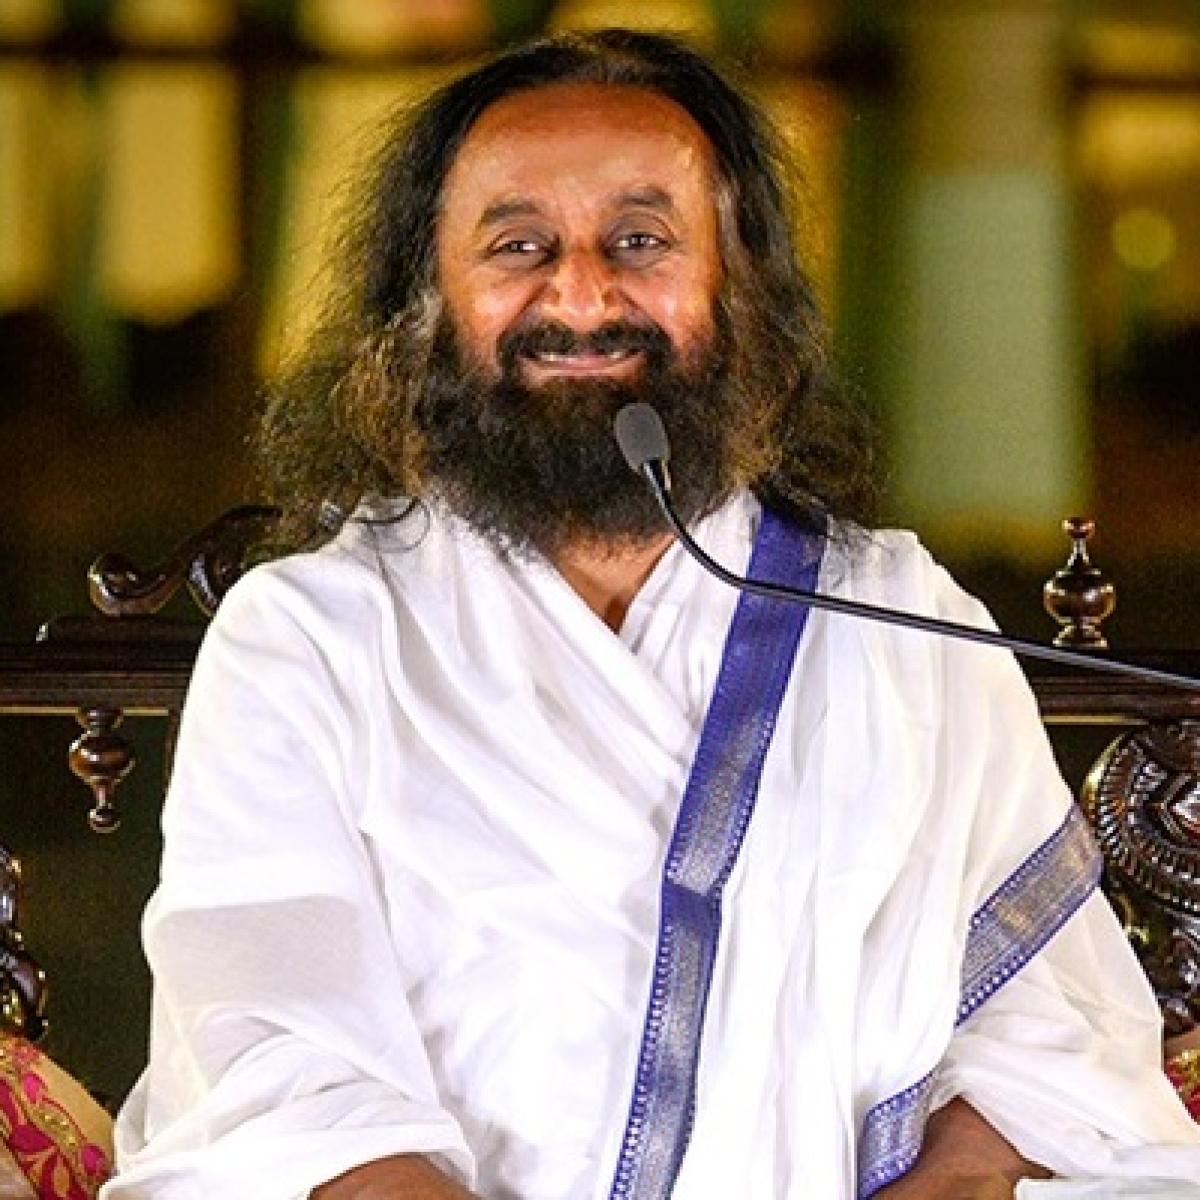 Guiding Light by Sri Sri Ravi Shankar: Love cannot be expressed